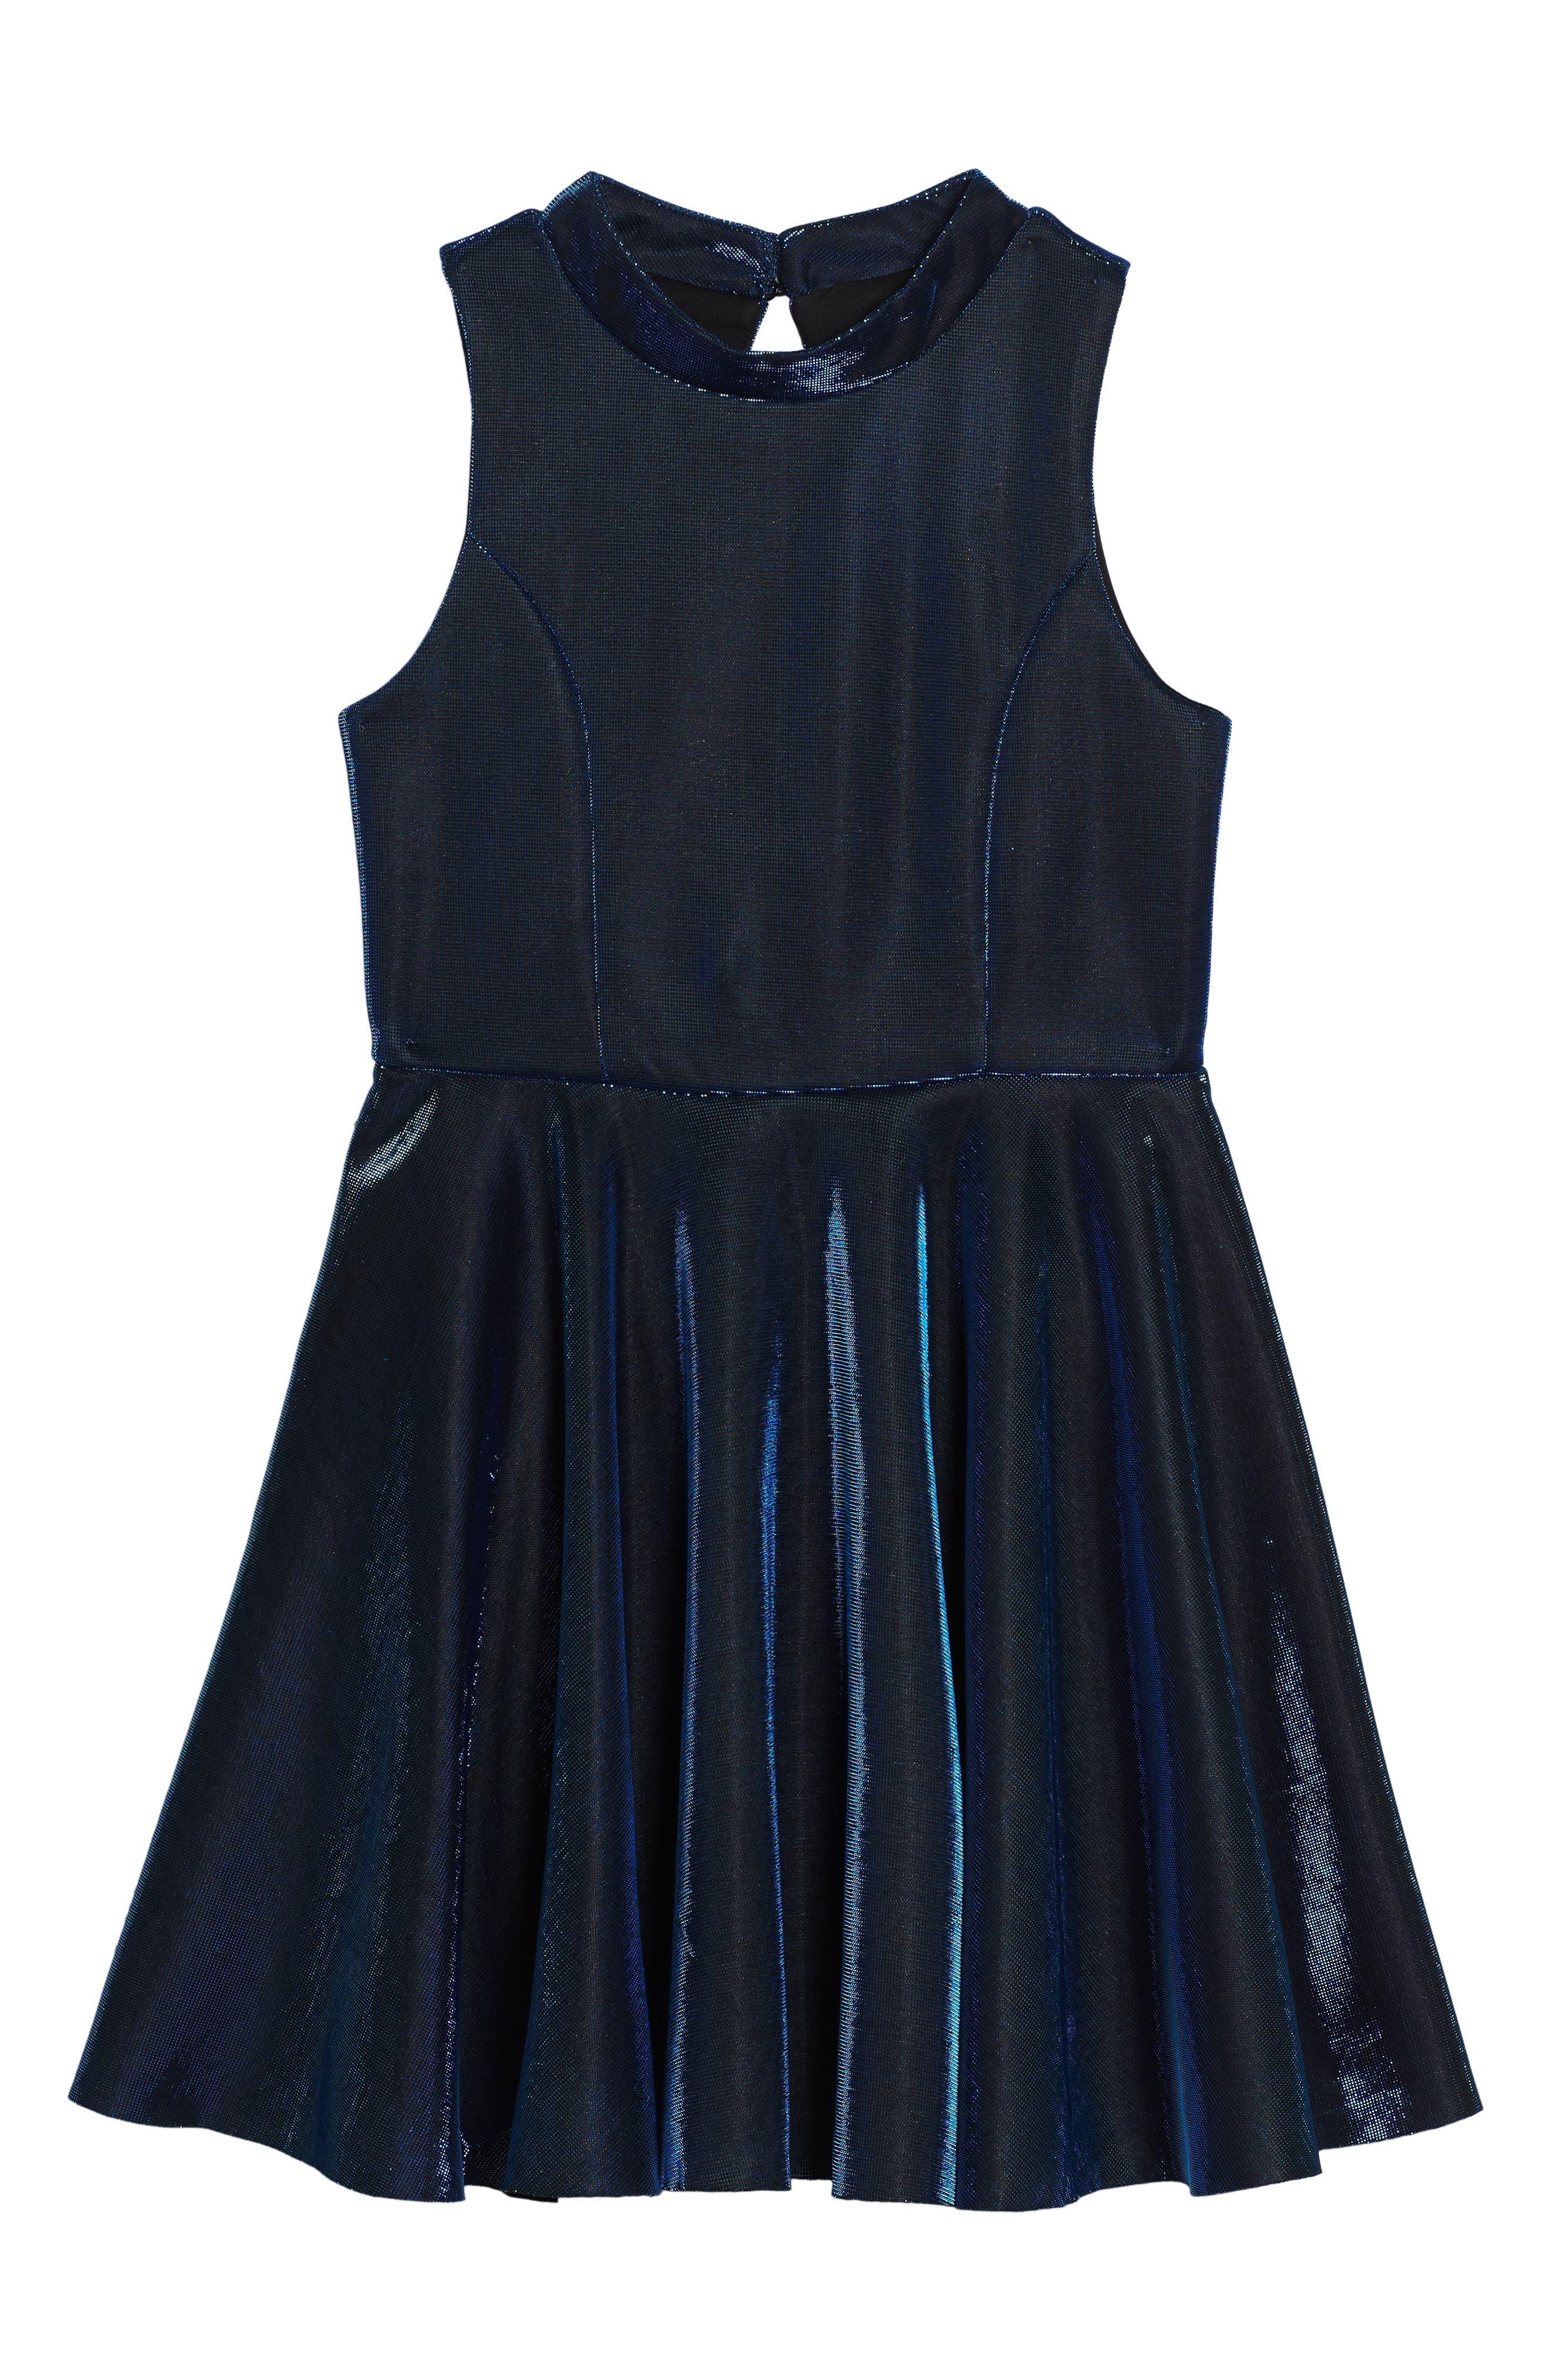 Iridescent Techno Skater Dress,                             Main thumbnail 1, color,                             420